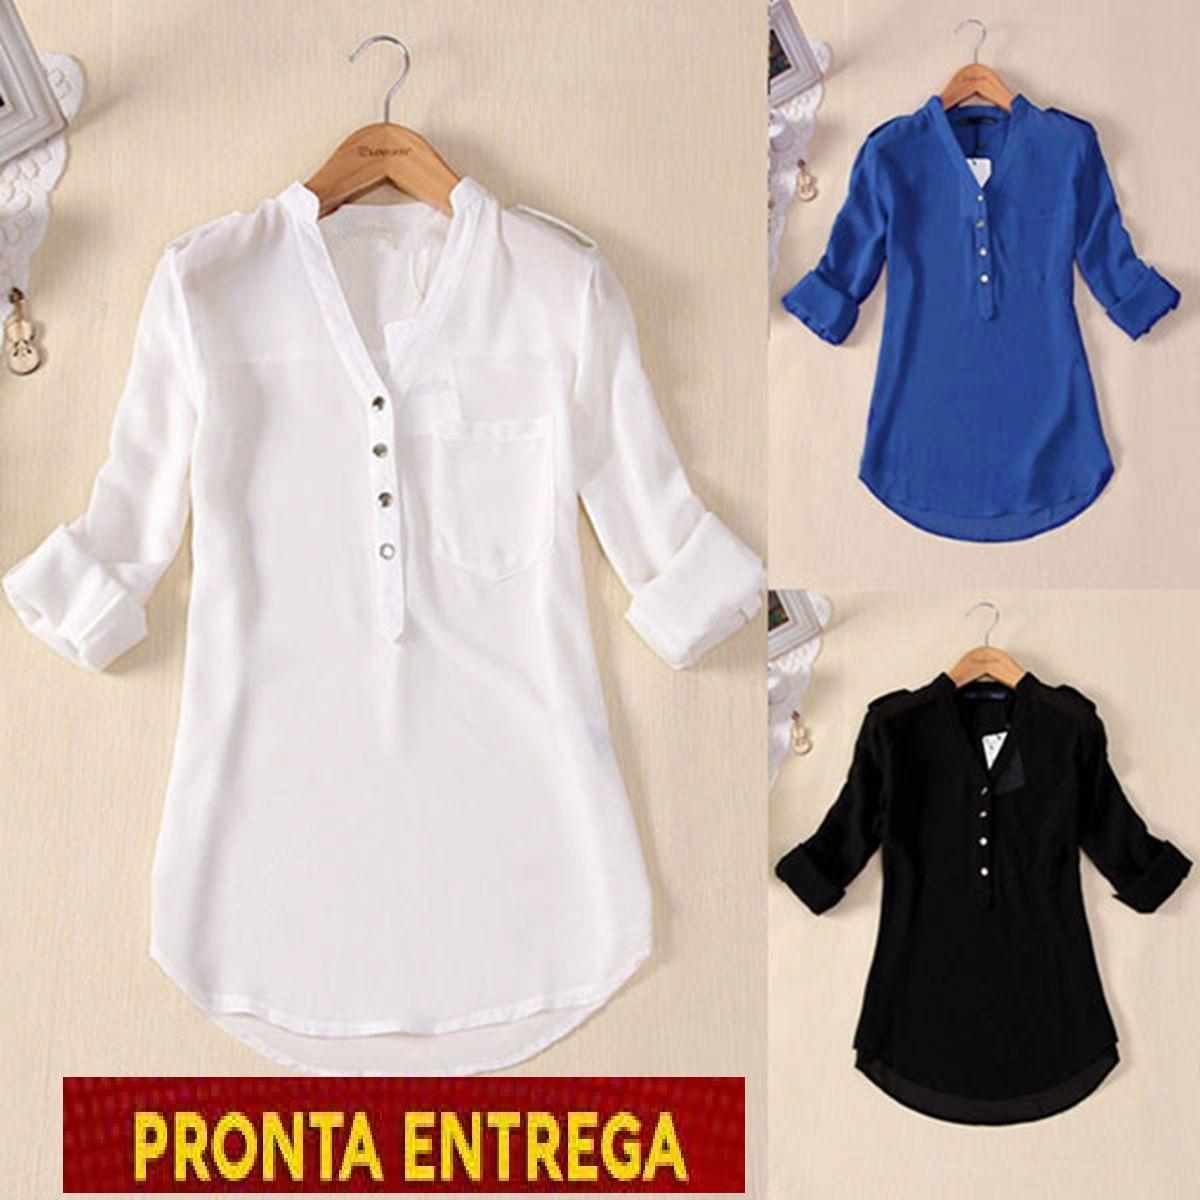 0ad9961297 camisa blusa feminina chiffon seda importada pronta entrega. Carregando  zoom.